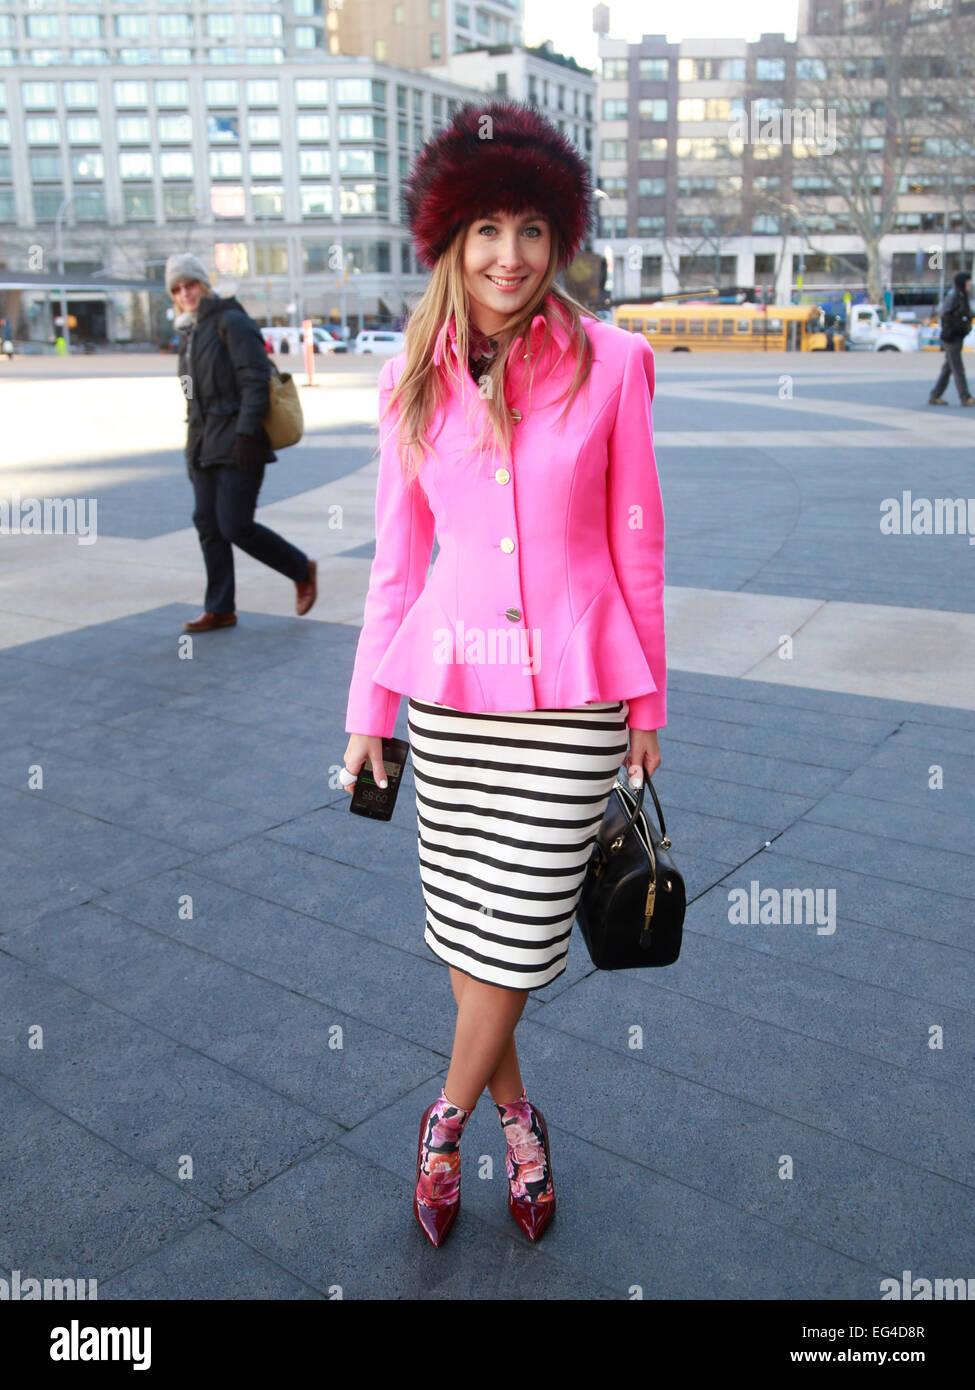 Sandra Kleine Staarman arriving at Mark & Estel runway show in New York City - Feb 13, 2015 - Photo: Runway - Stock Image